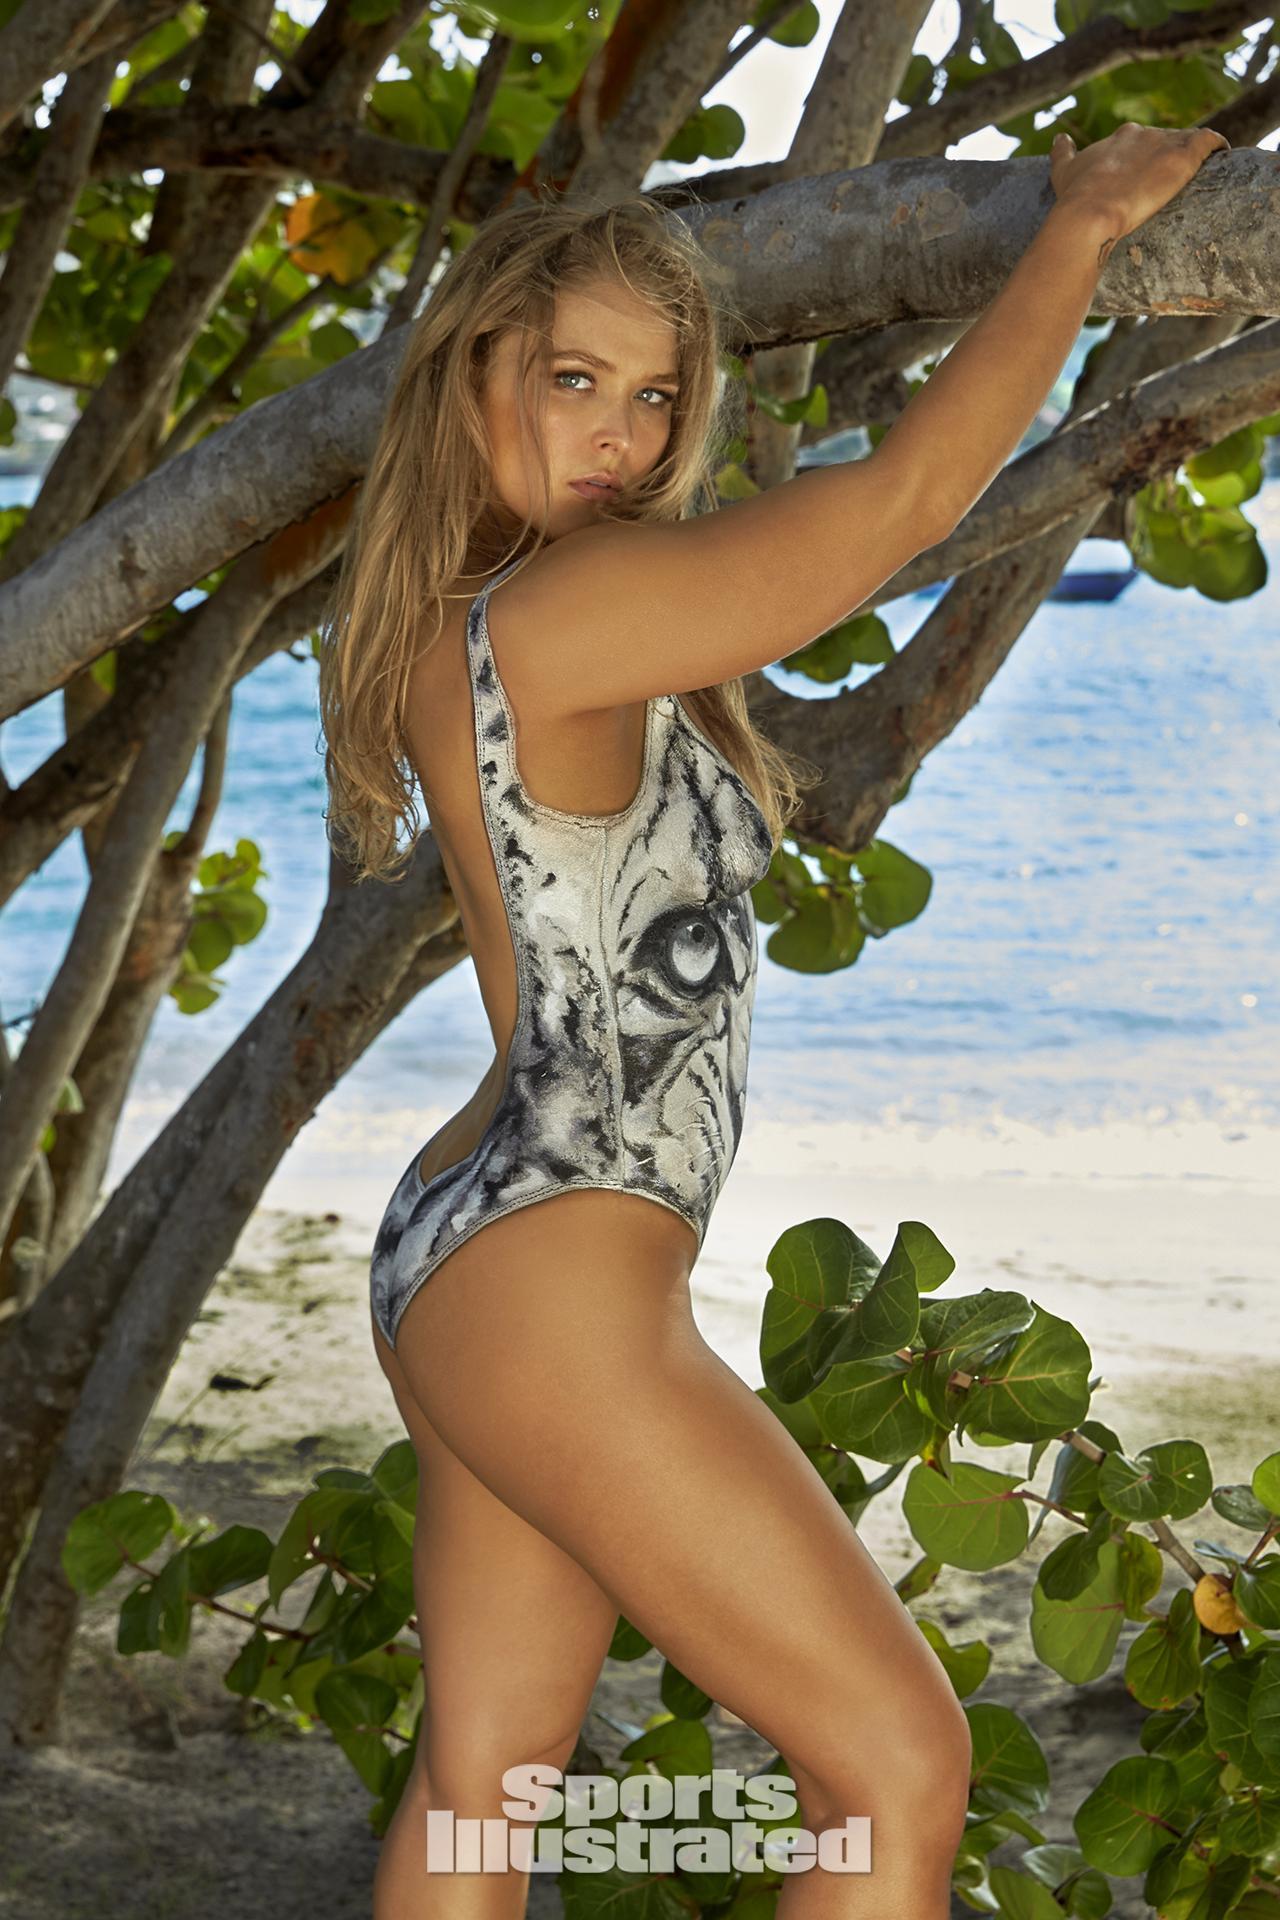 ronda rousey swimsuit body paint photos sports illustrated swimsuit